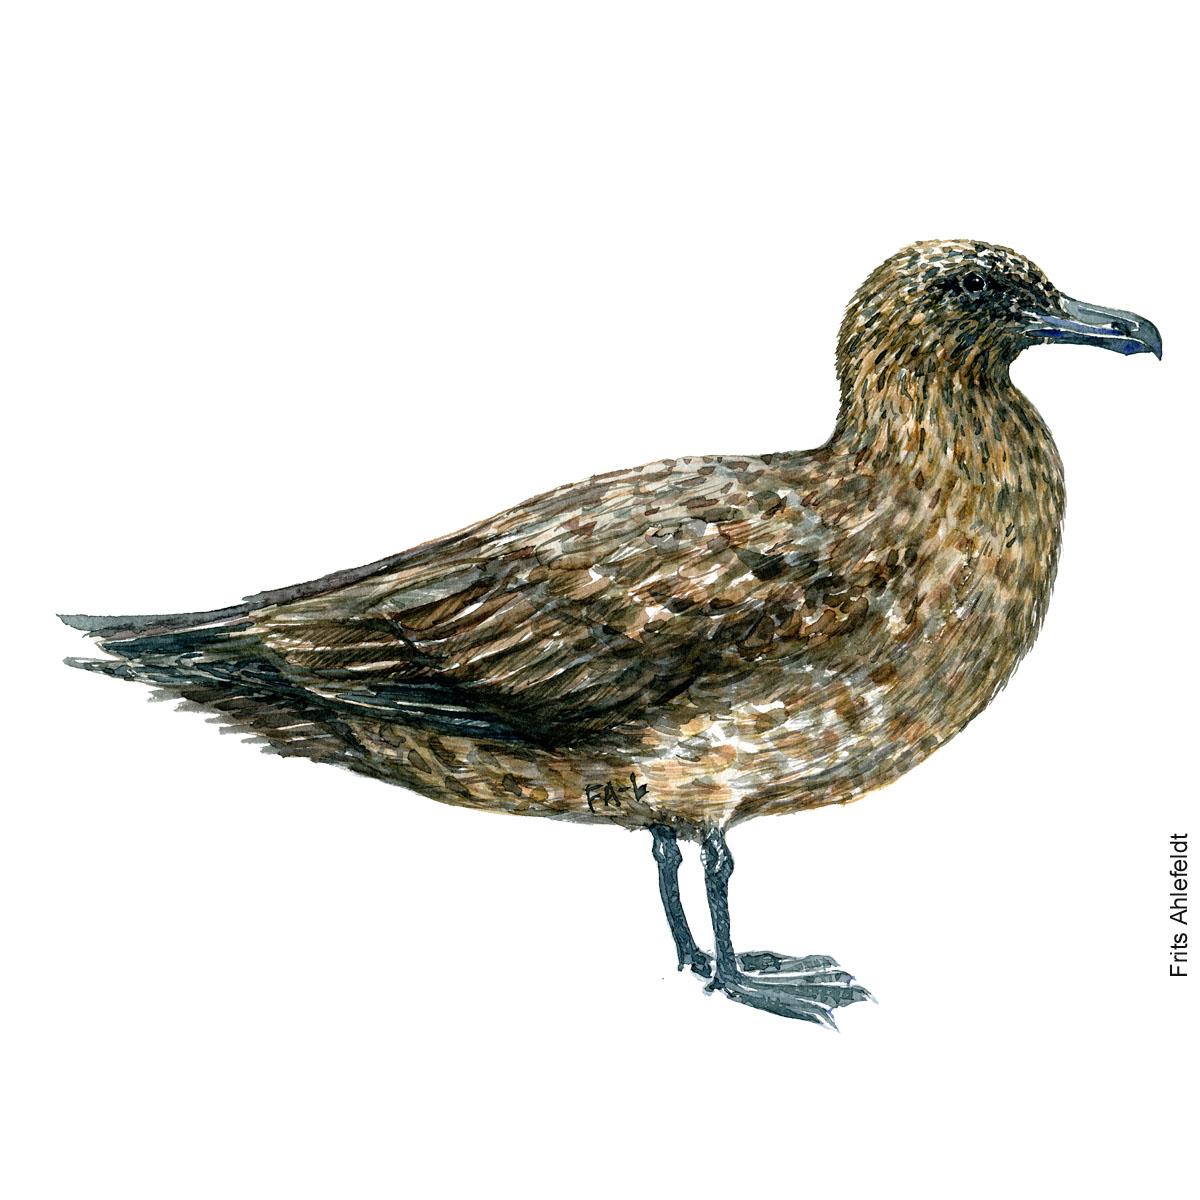 Storkjove - Great skua Bird watercolor. Fugle akvarel af Frits Ahlefeldt